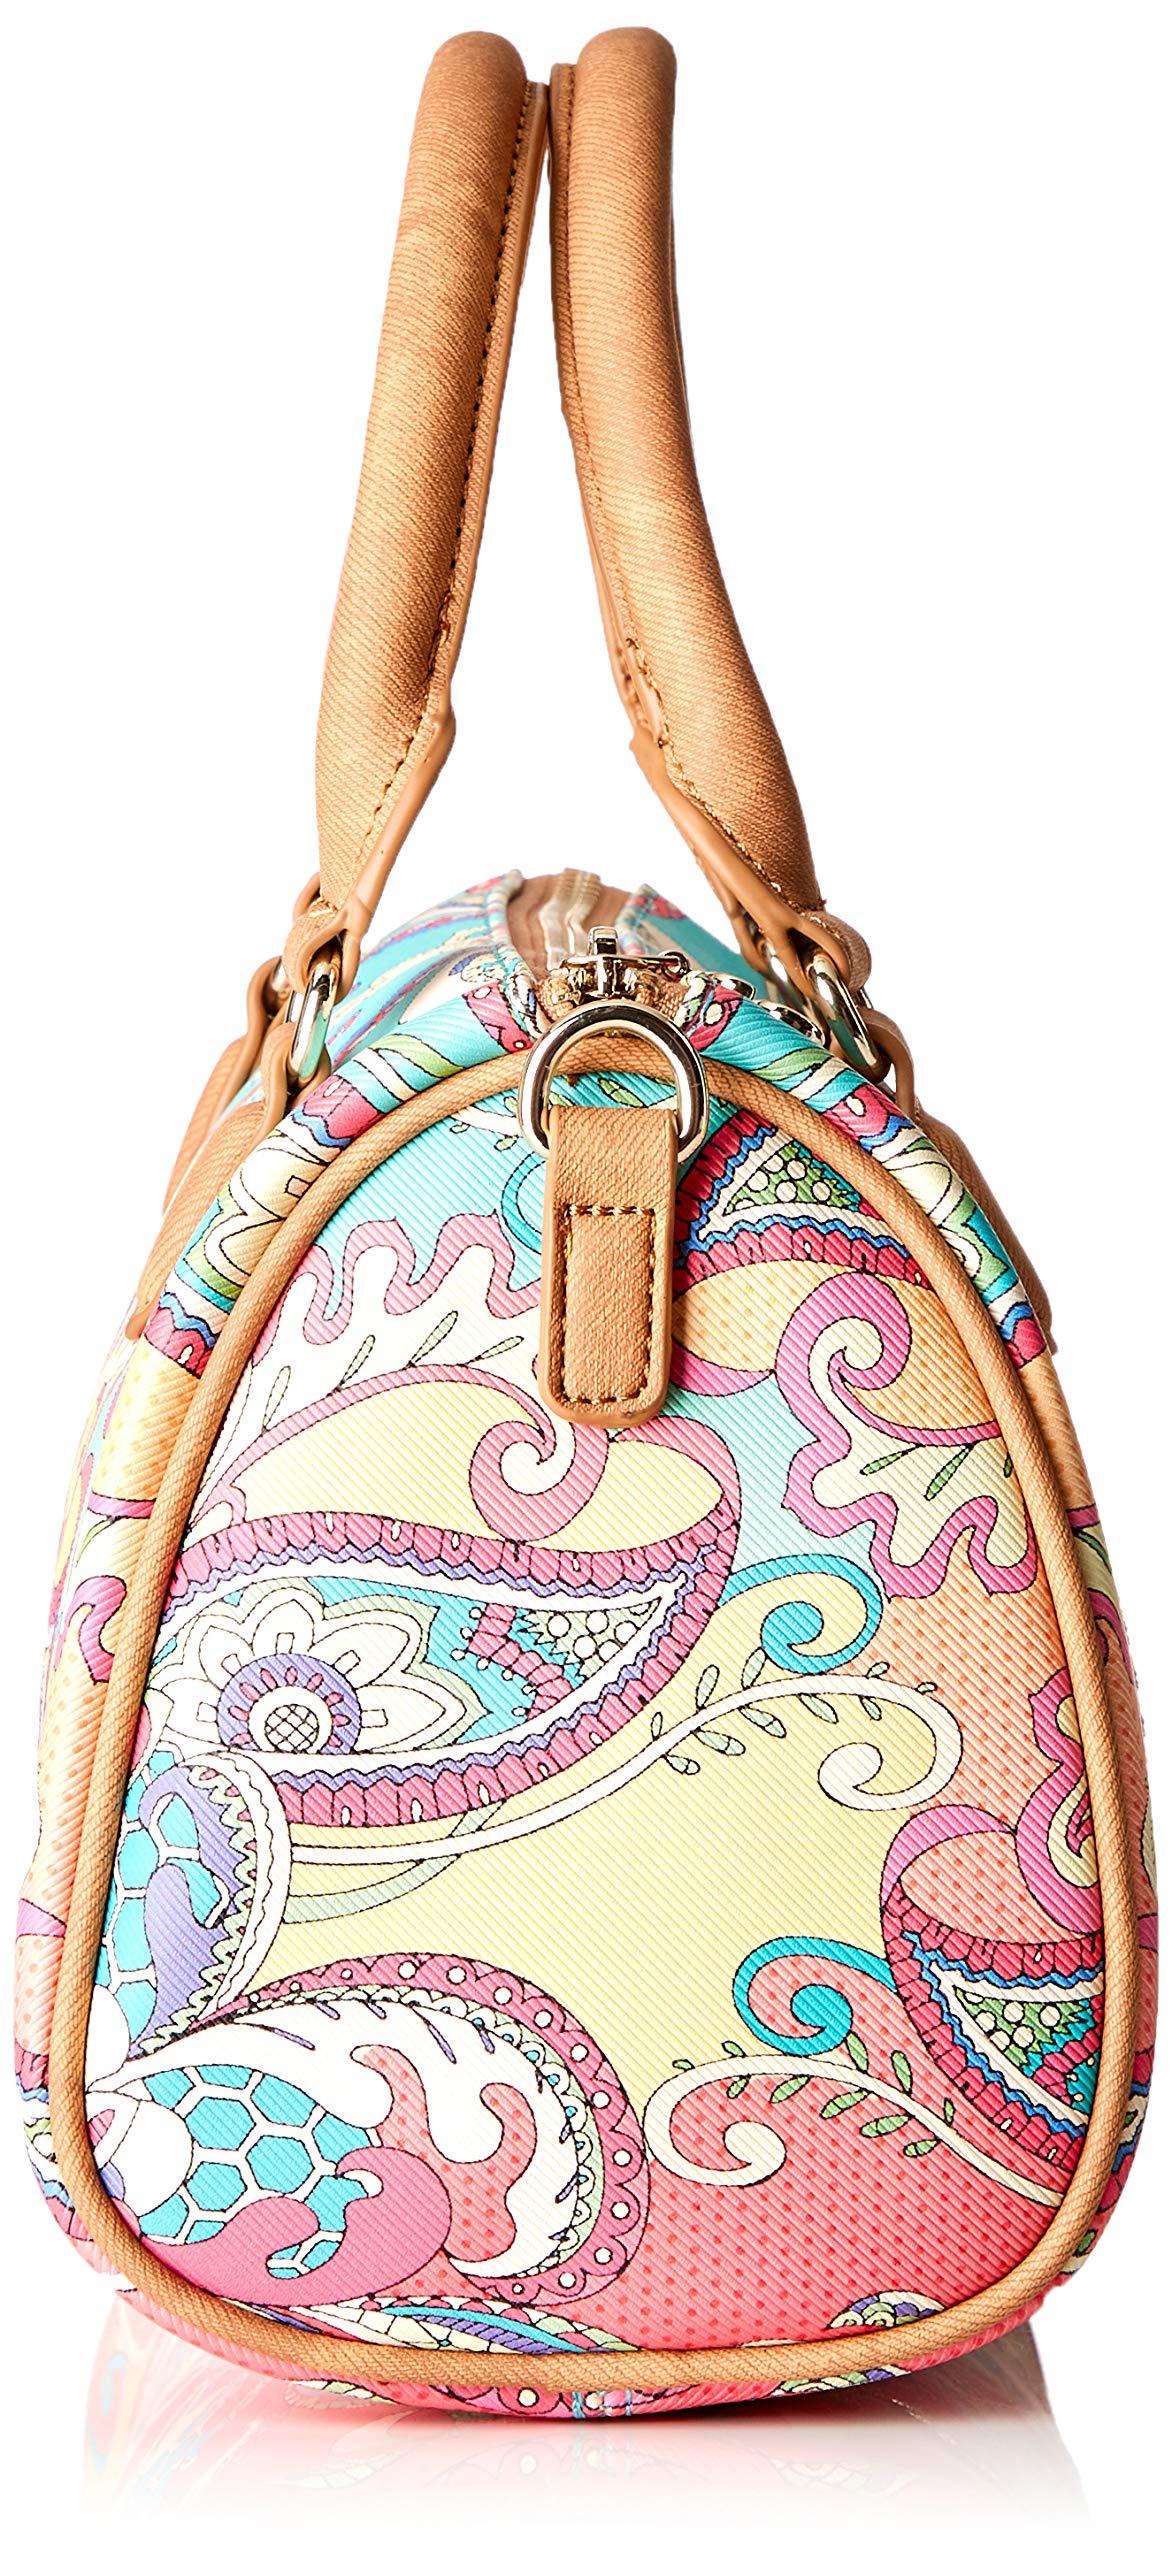 Desigual Bag Grand Valkiria Bowling Med Women - Borsette da polso Donna, Arancione (Coral), 13.7x18x27 cm (B x H T) 3 spesavip